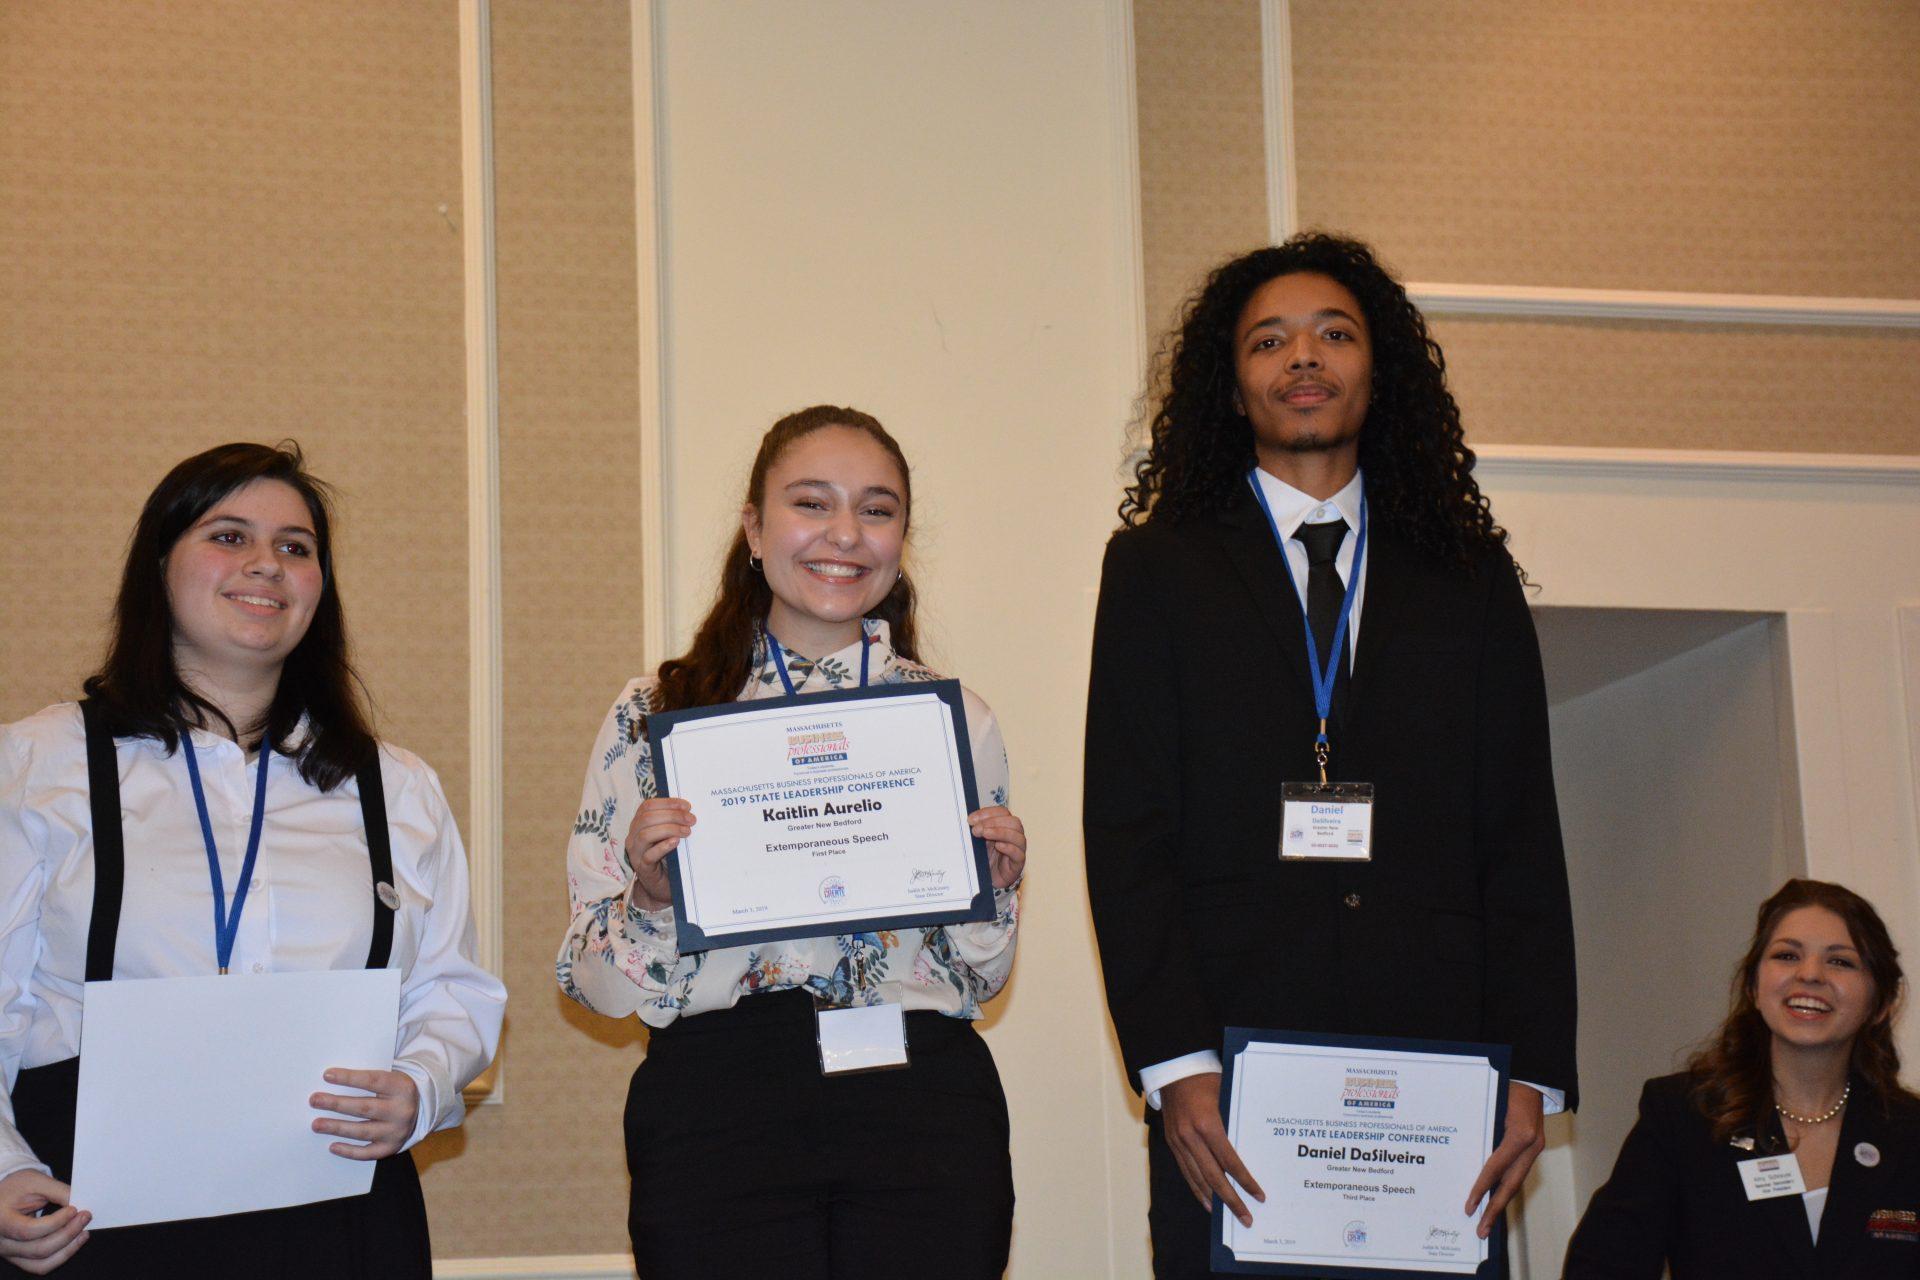 BPA SLC 2019 Conference Awards